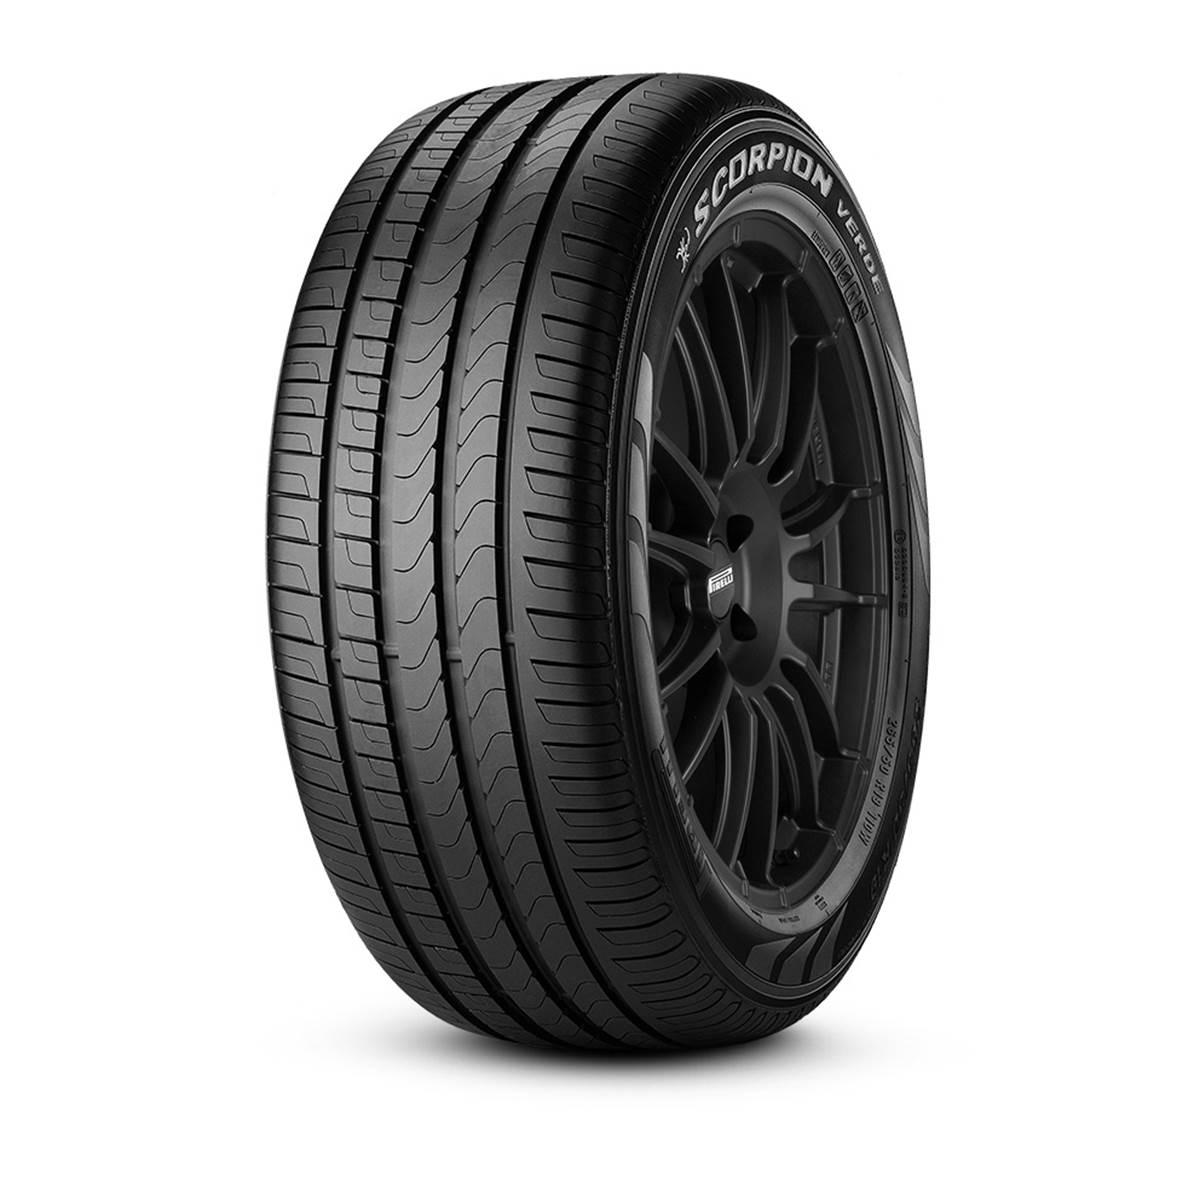 Pirelli Scorpion Verde Homologue Mercedes